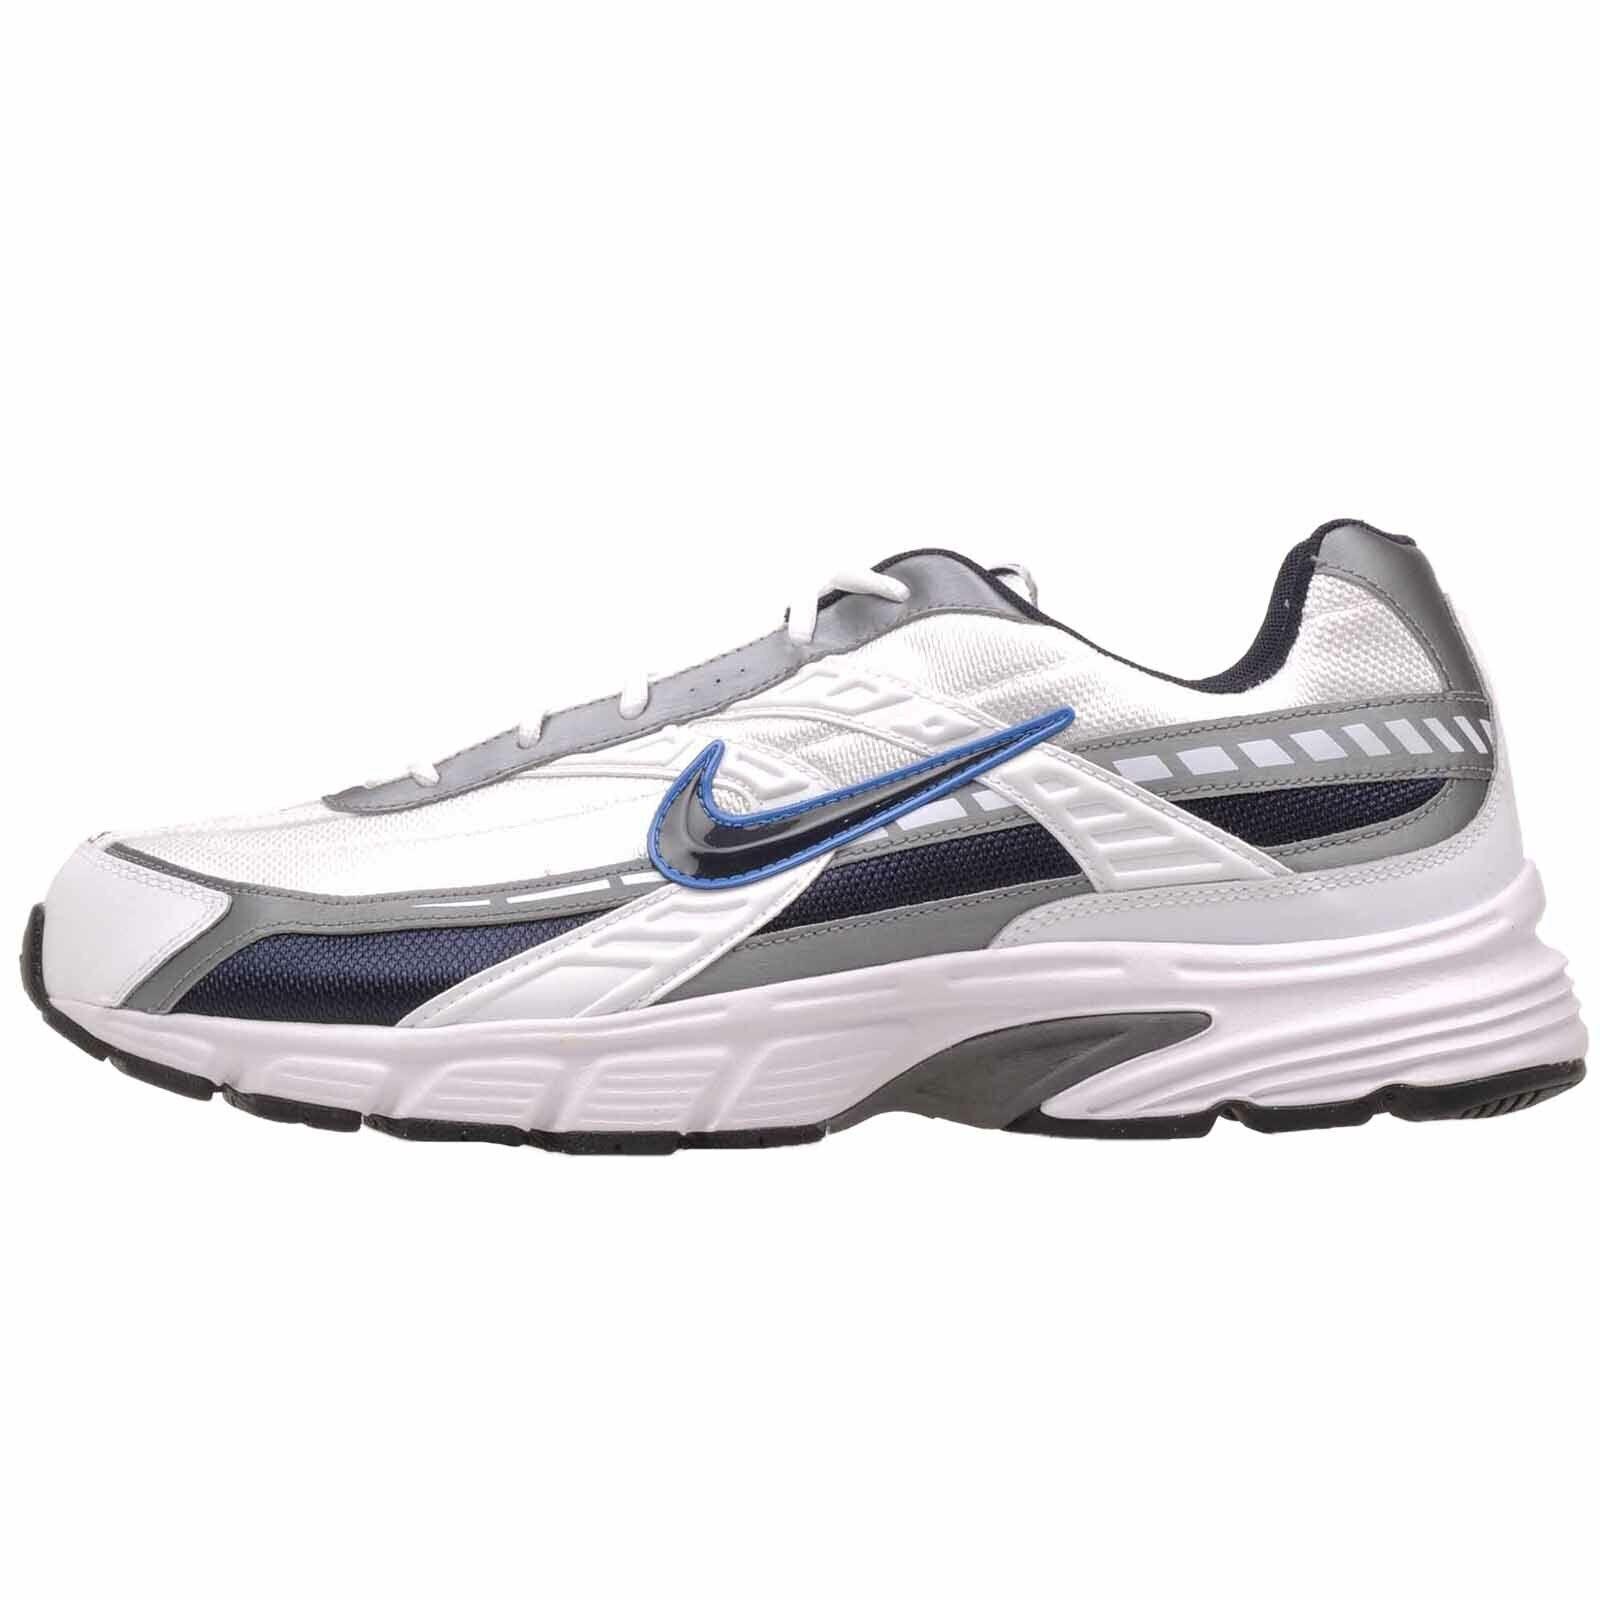 Nike Initiator (Wide) Running Mens zapatos NWOB blanco gris 395662-101